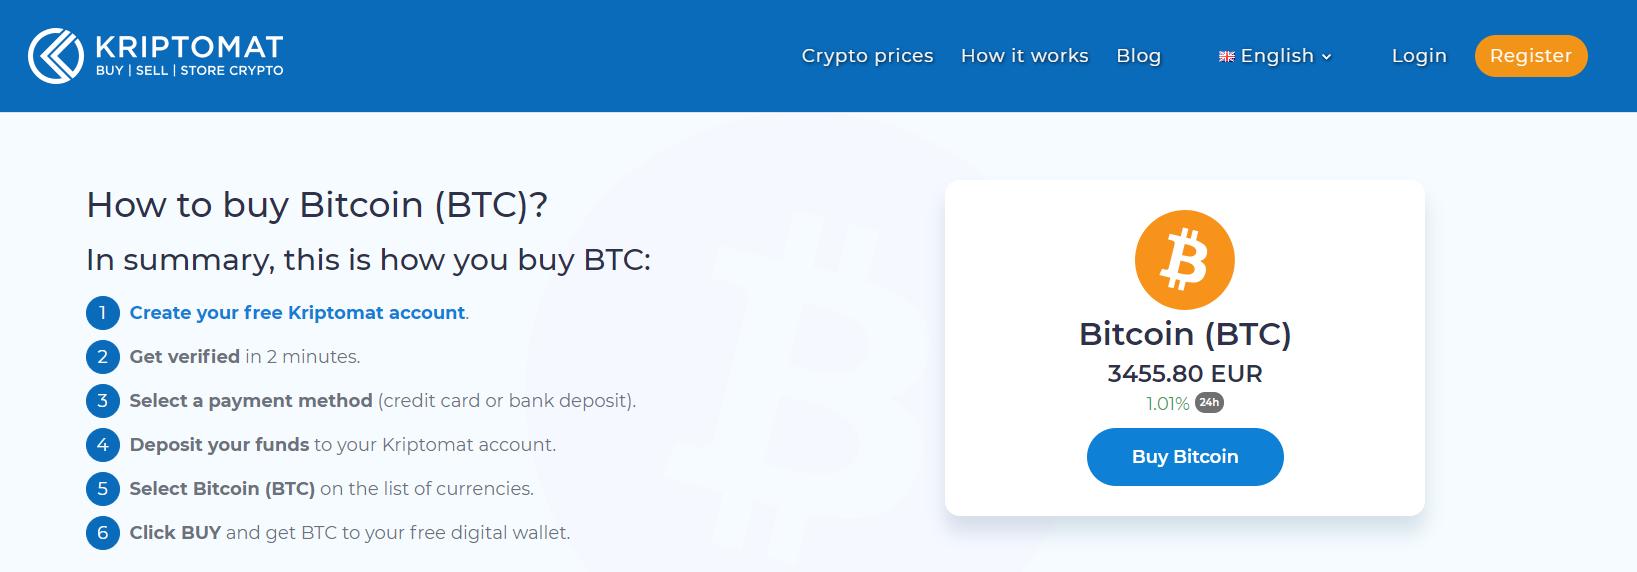 Kriptomat Purchase Interface